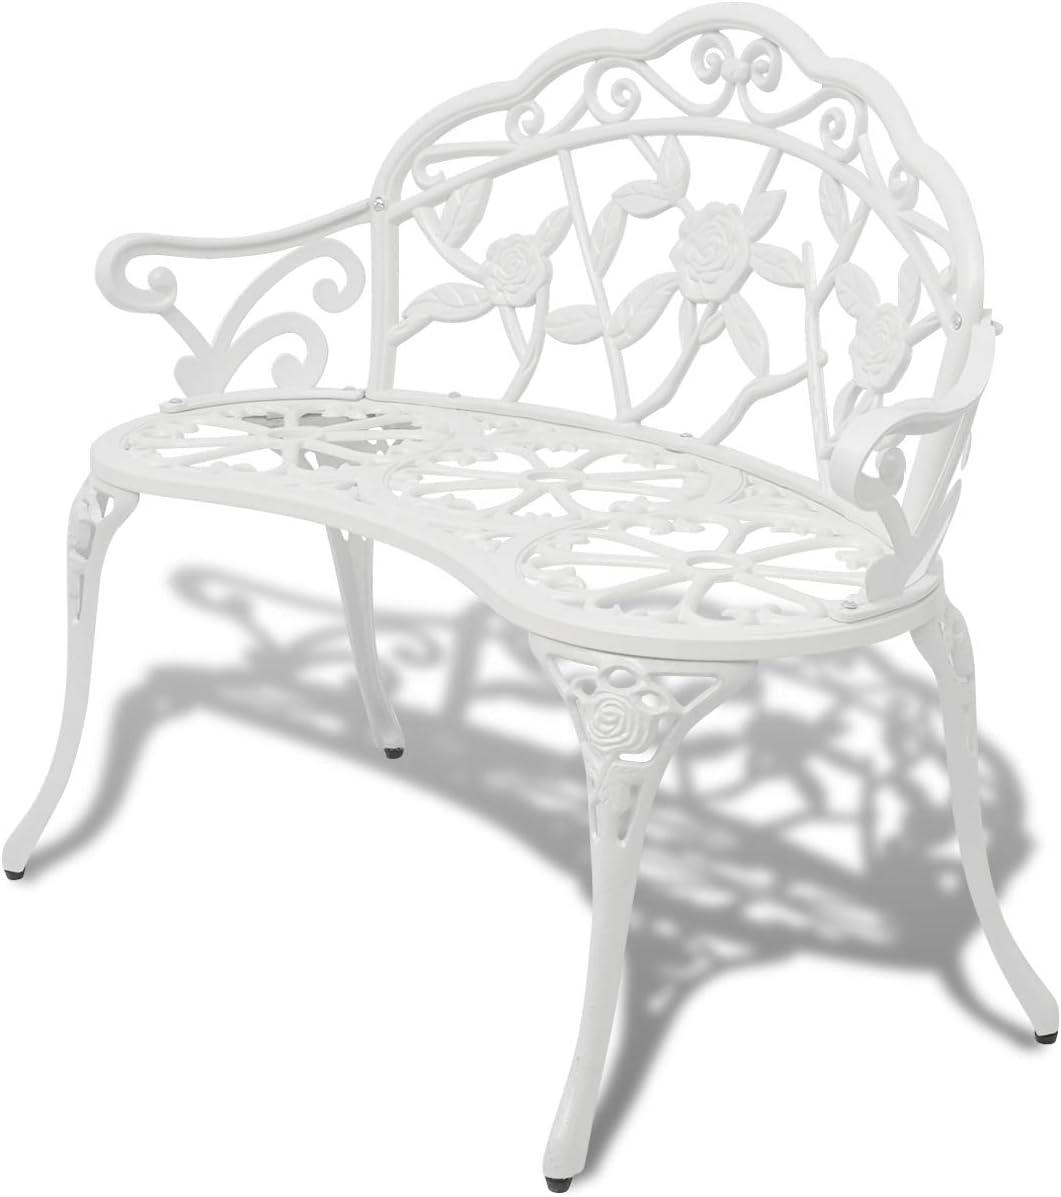 vidaXL Patio Garden Bench Chair Porch Park Cast Aluminum Outdoor Rose Antique White